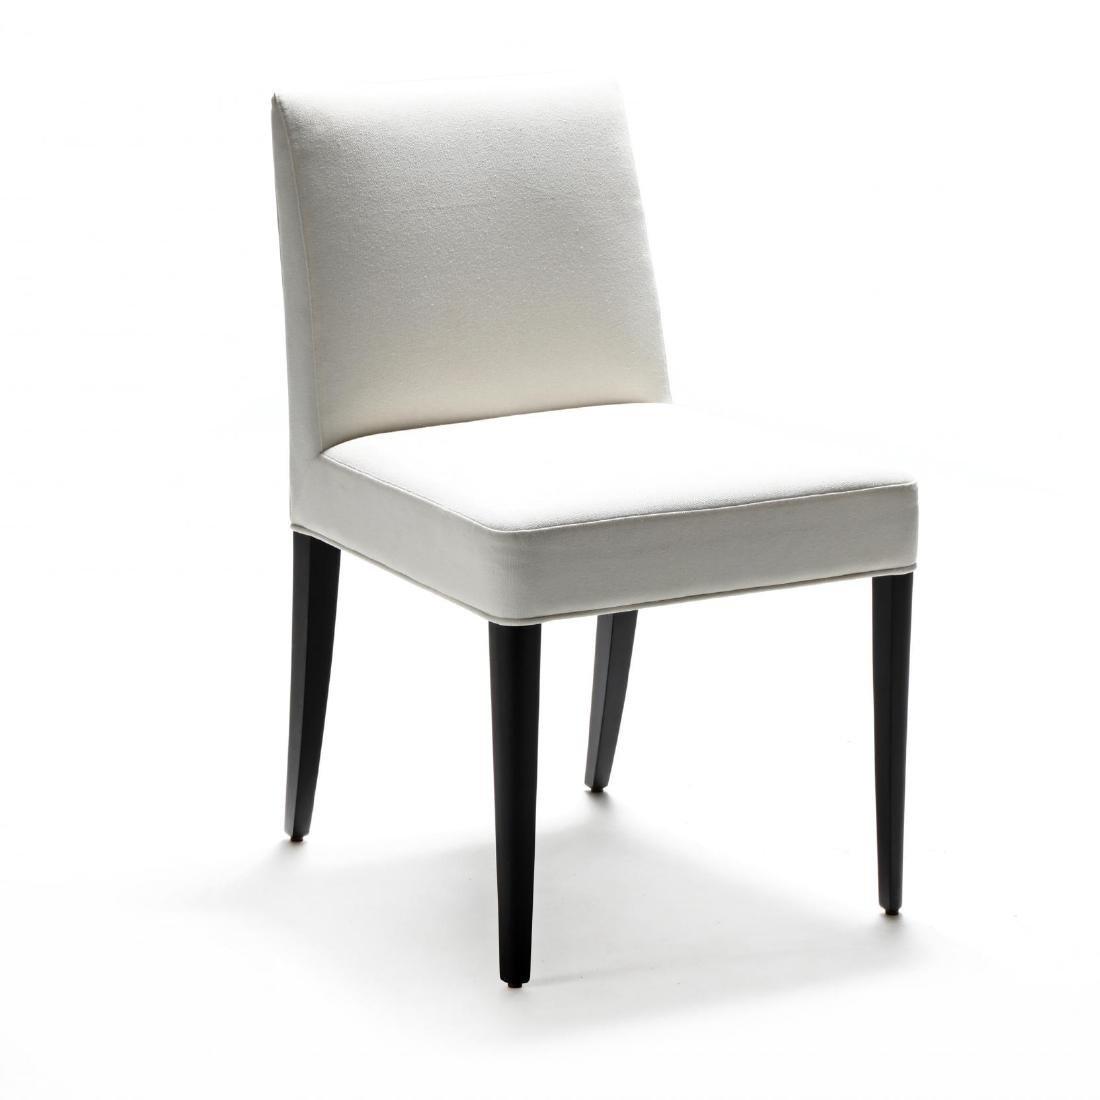 Kara Mann, Set of Four Contemporary Upholstered Dining - 3